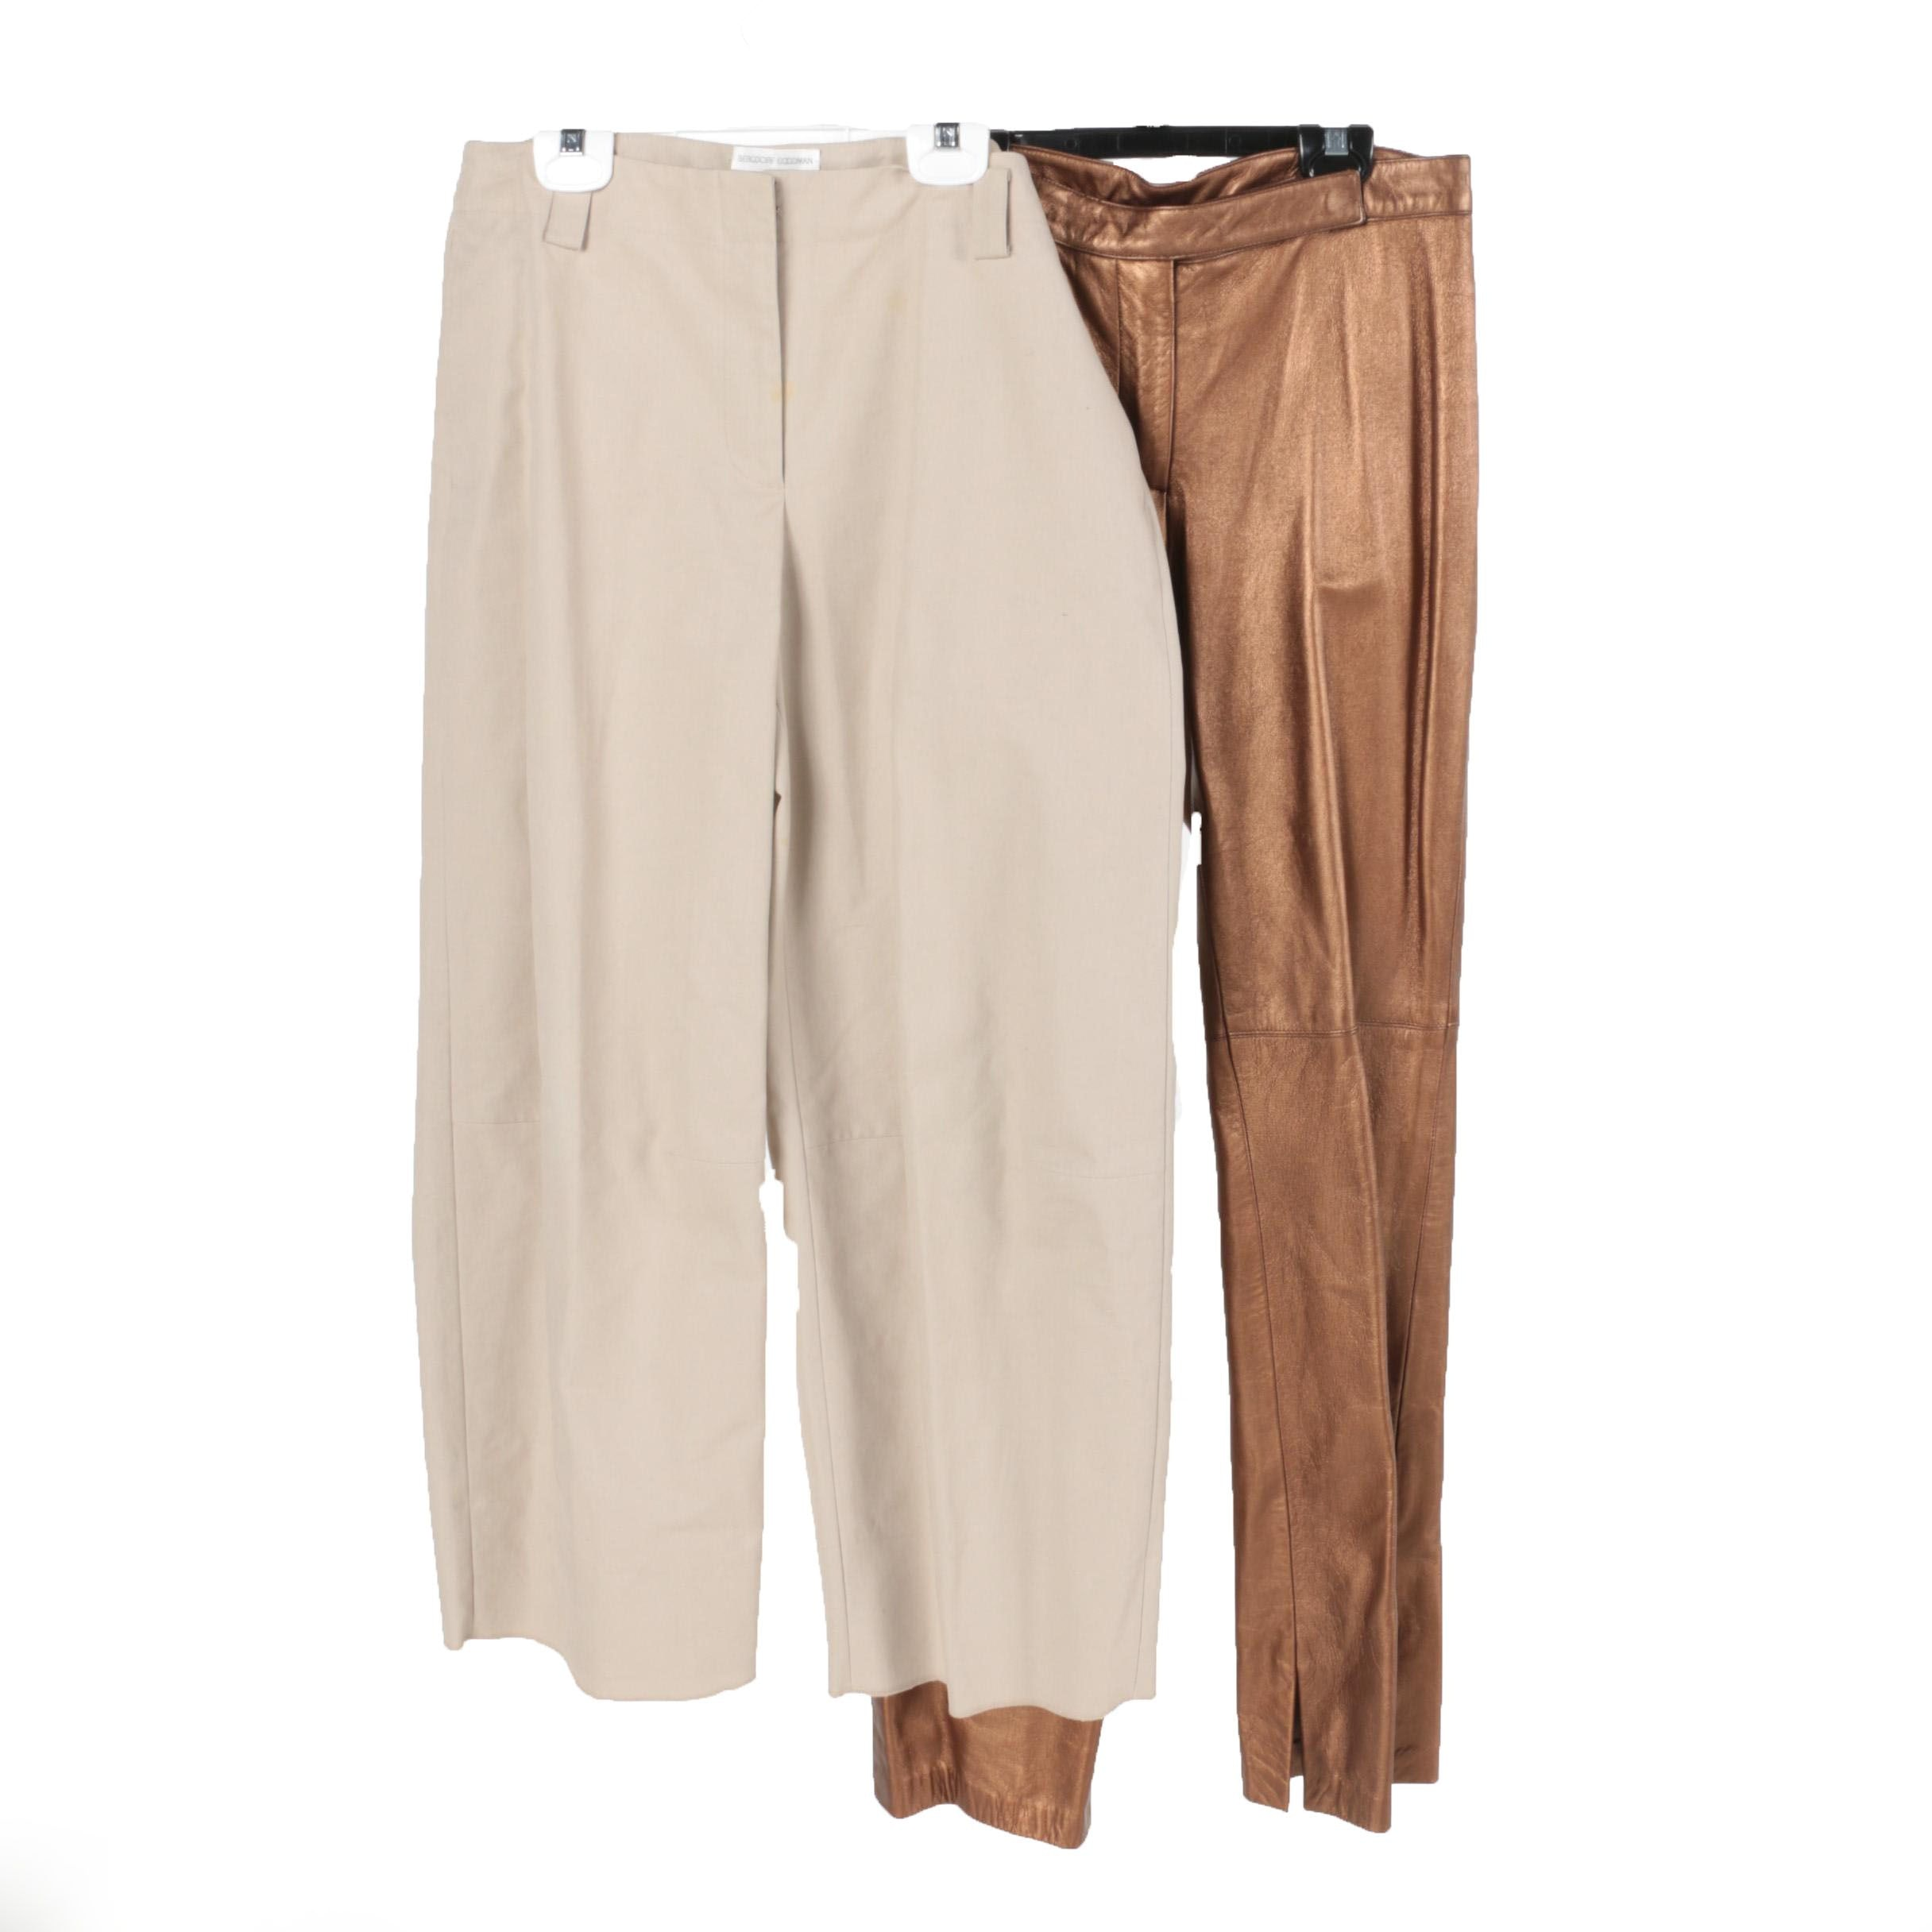 Cheap dress pants near me laundromat